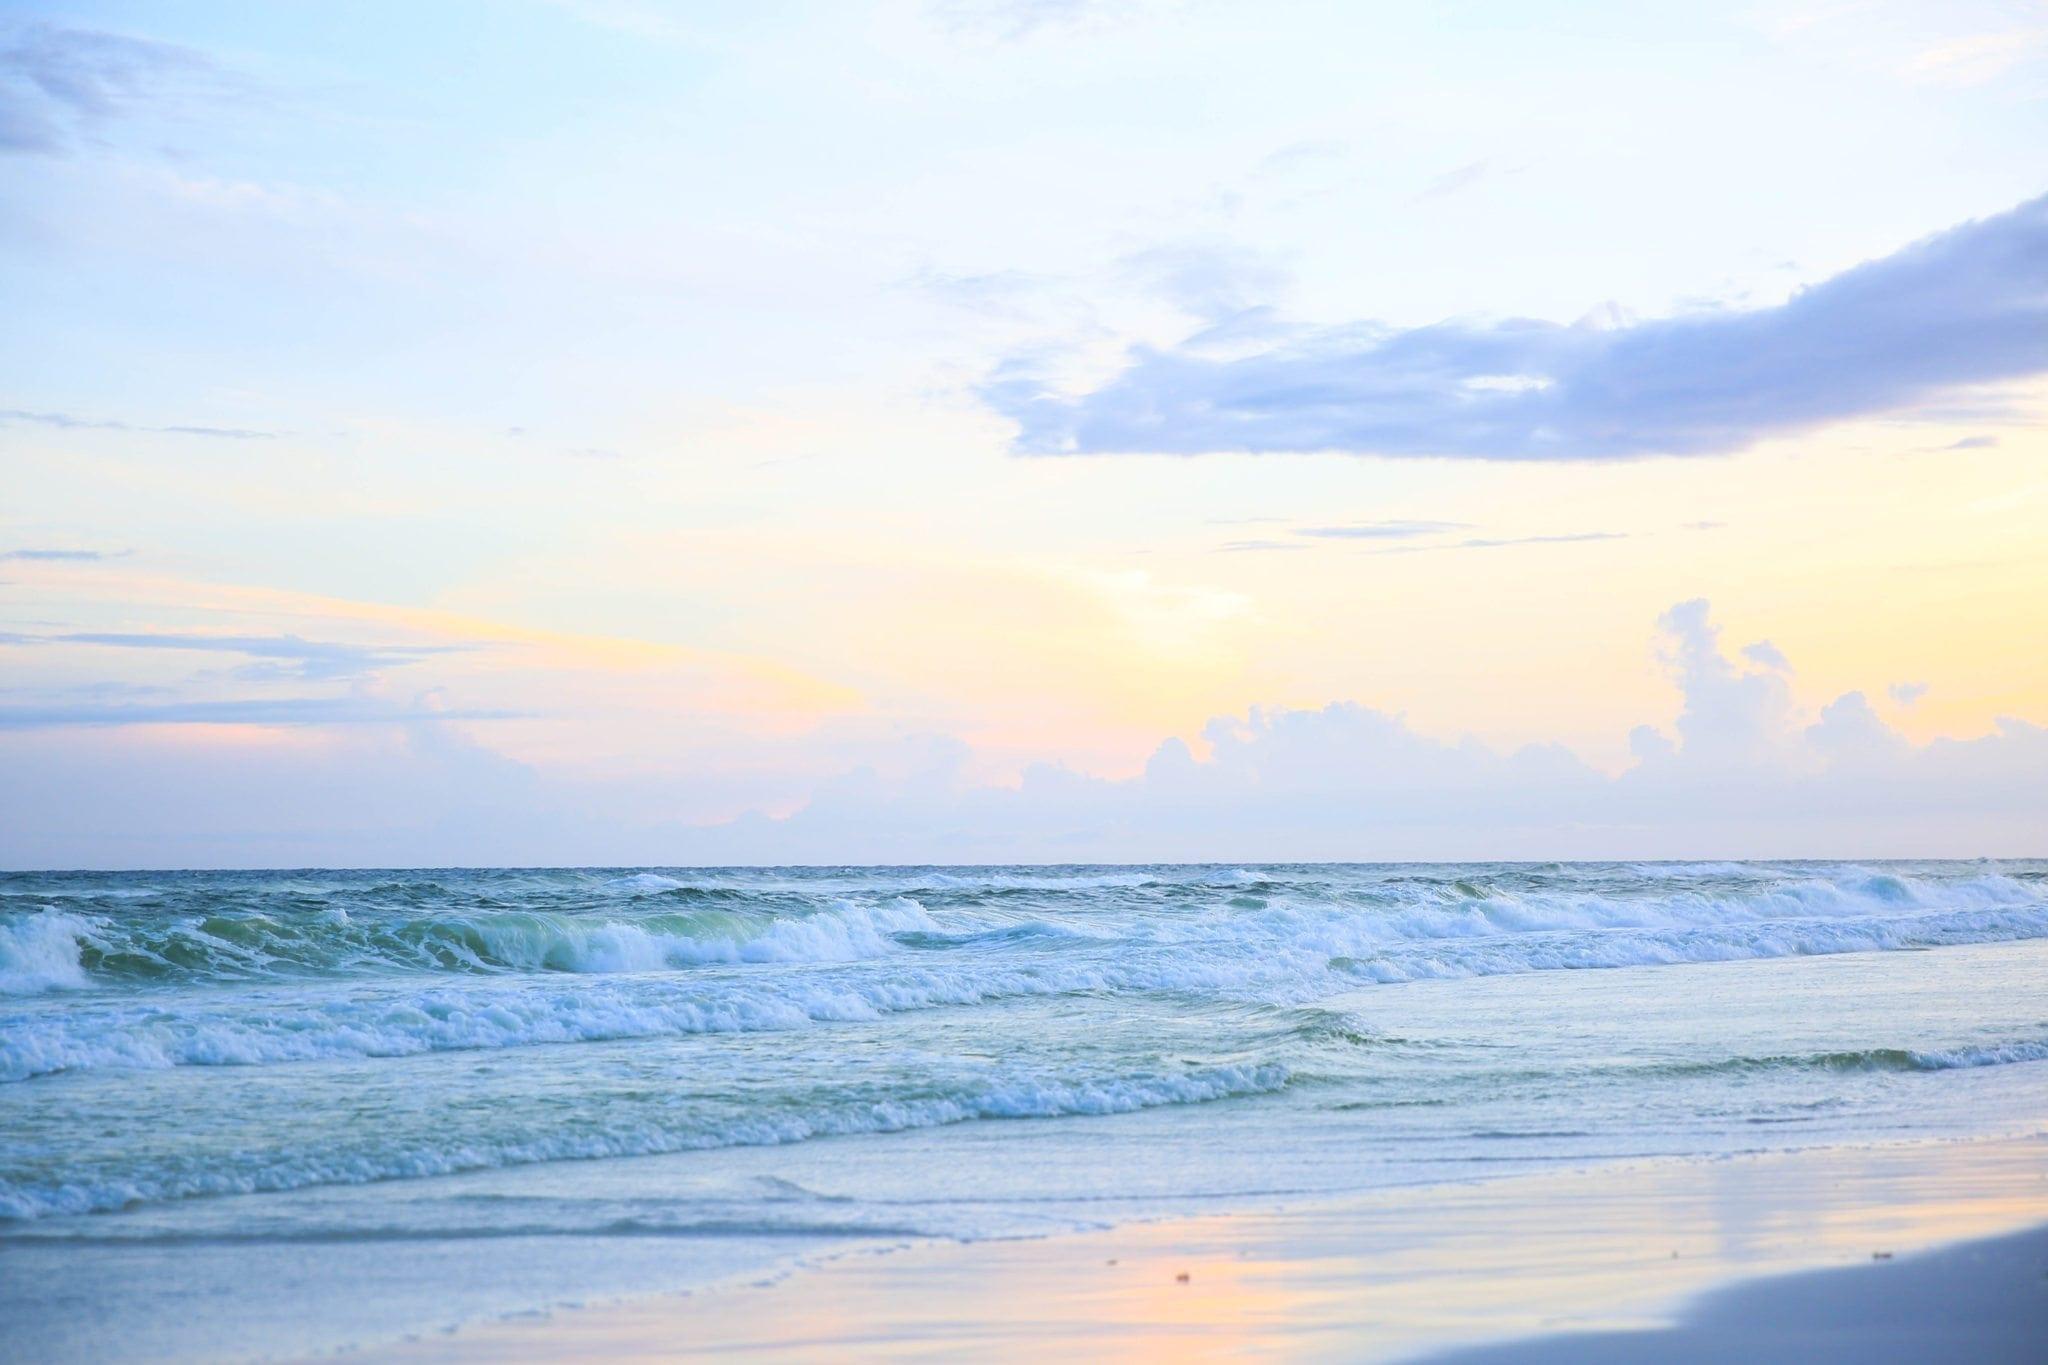 Beach sunset in Destin.